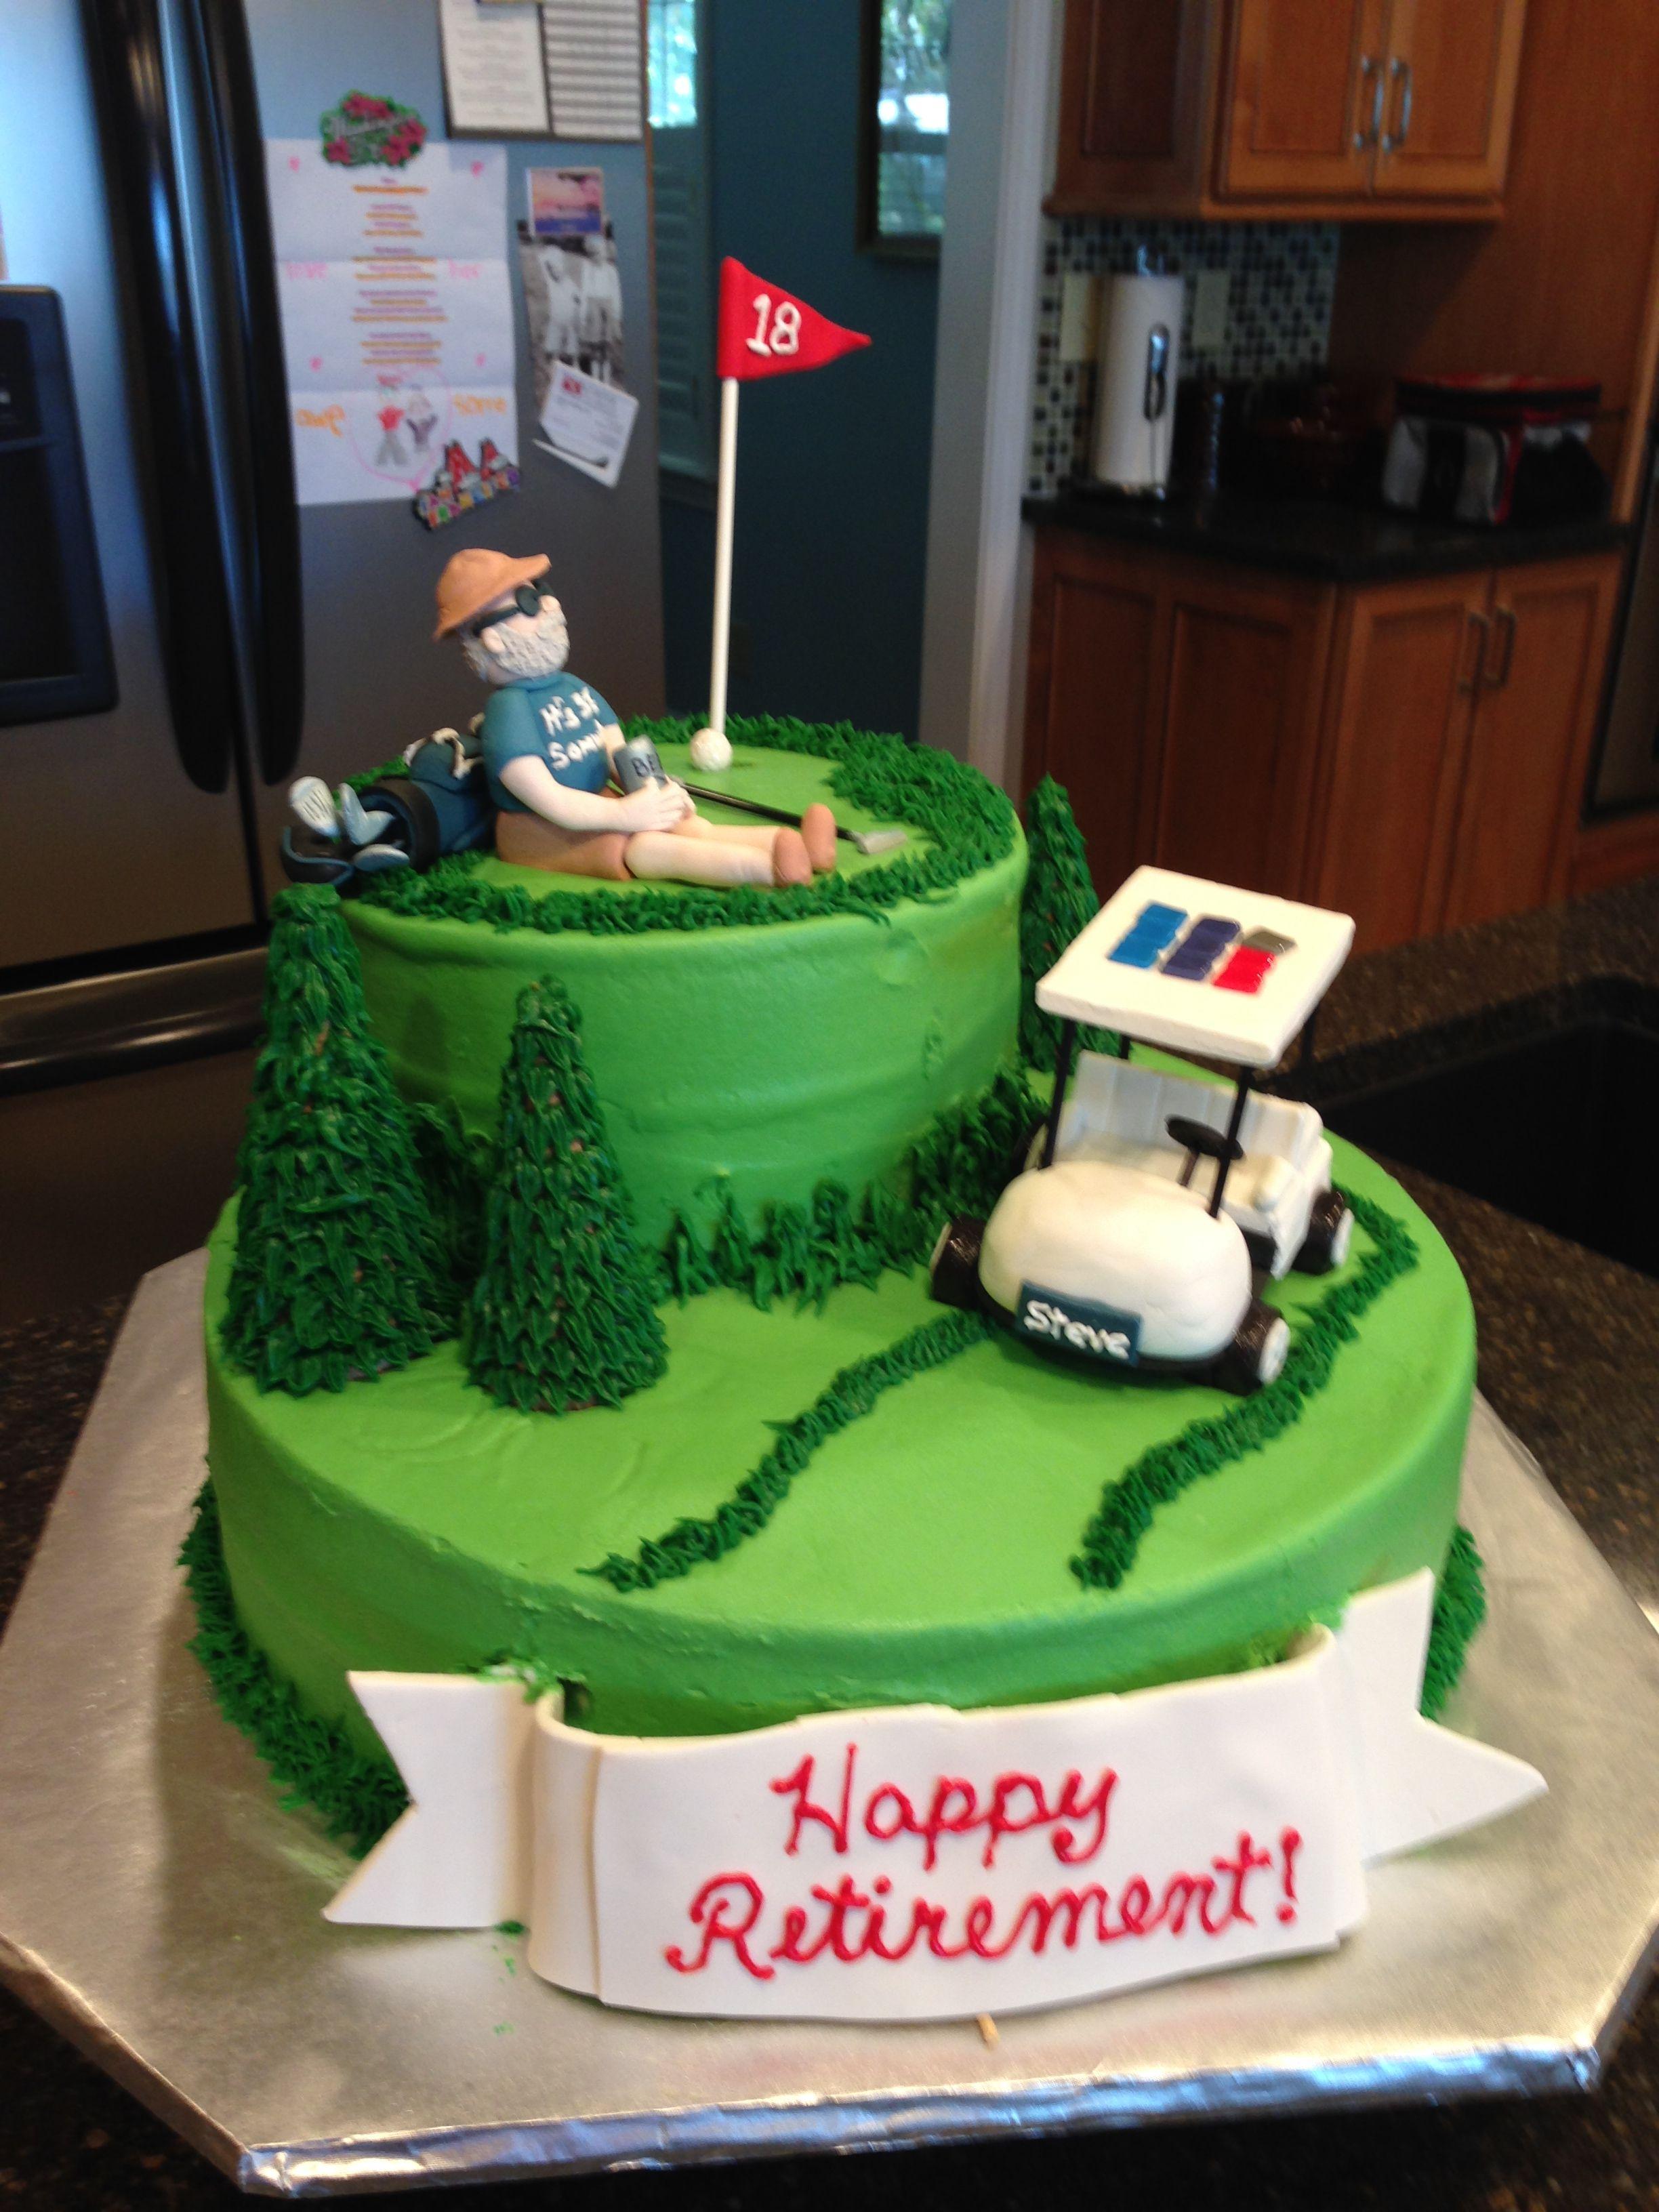 retirement cake- golfer